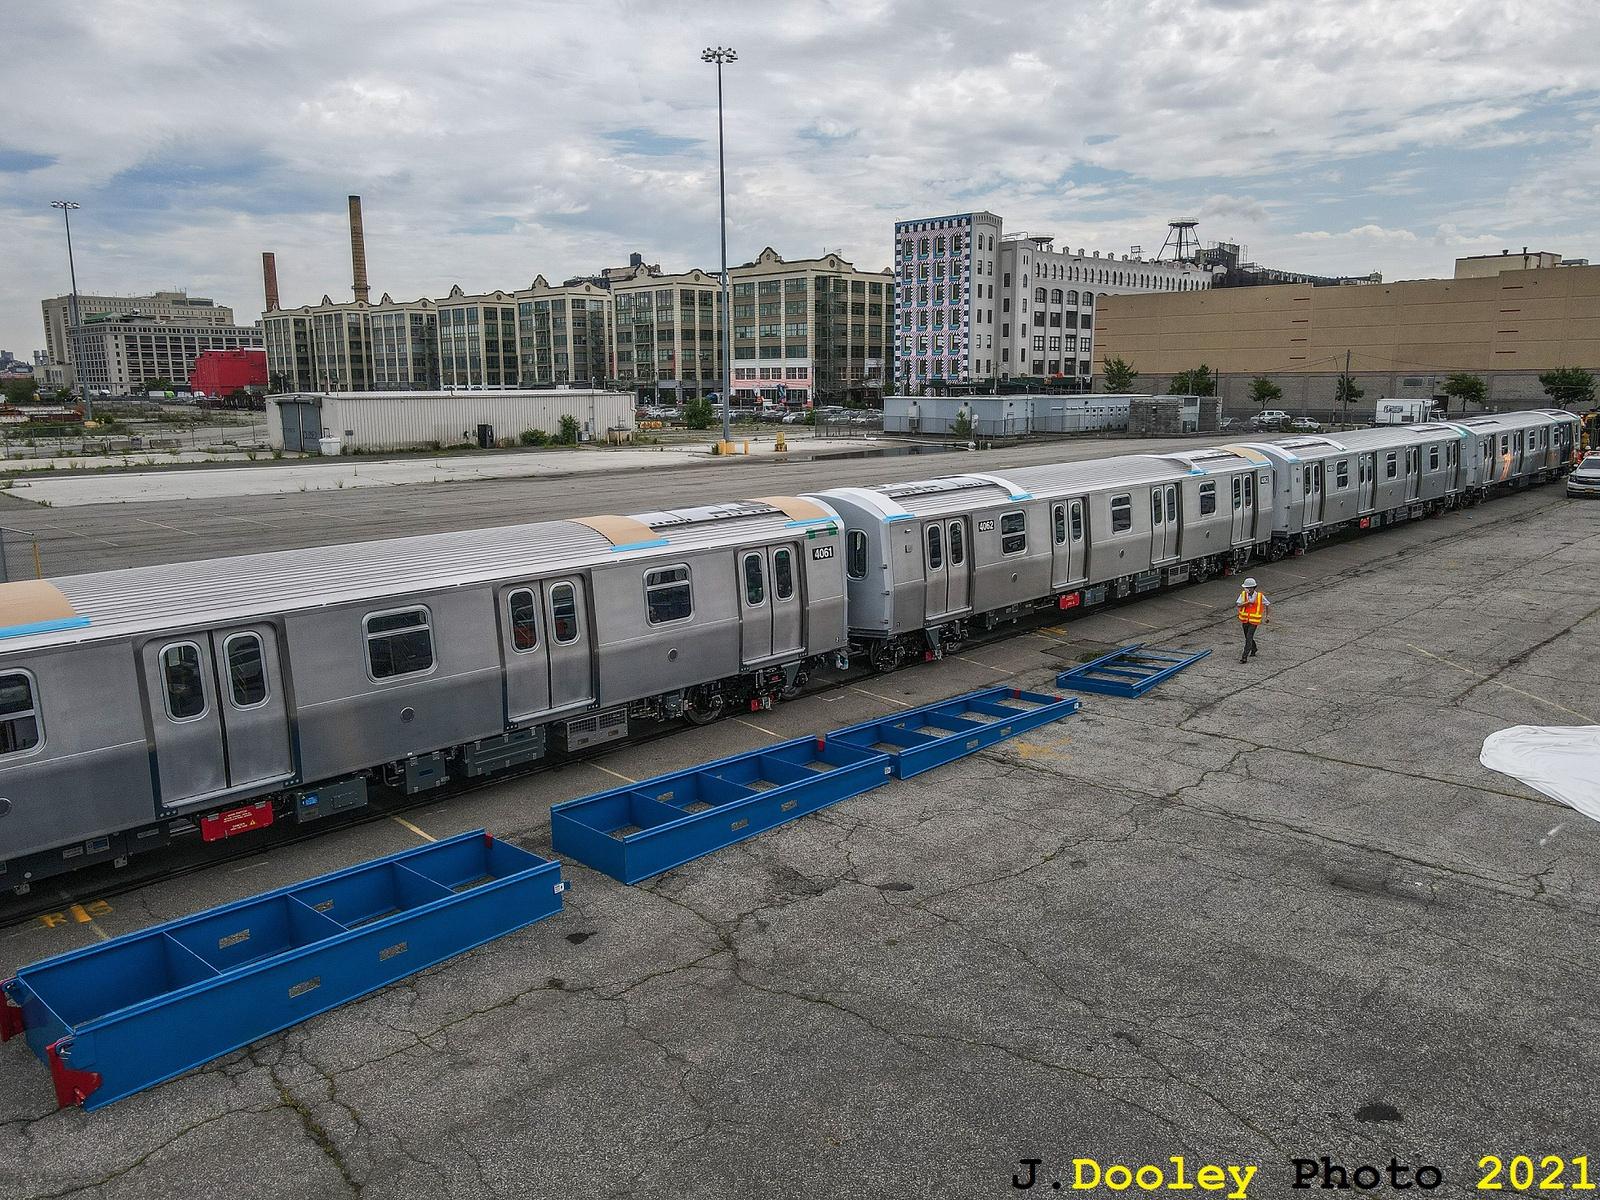 (1045k, 1600x1200)<br><b>Country:</b> United States<br><b>City:</b> New York<br><b>System:</b> New York City Transit<br><b>Car:</b> R-211 (Kawasaki, 2021-) 4061-4062 <br><b>Photo by:</b> John Dooley<br><b>Date:</b> 7/1/2021<br><b>Notes:</b> R-211 delivery and press conference.<br><b>Viewed (this week/total):</b> 3 / 285